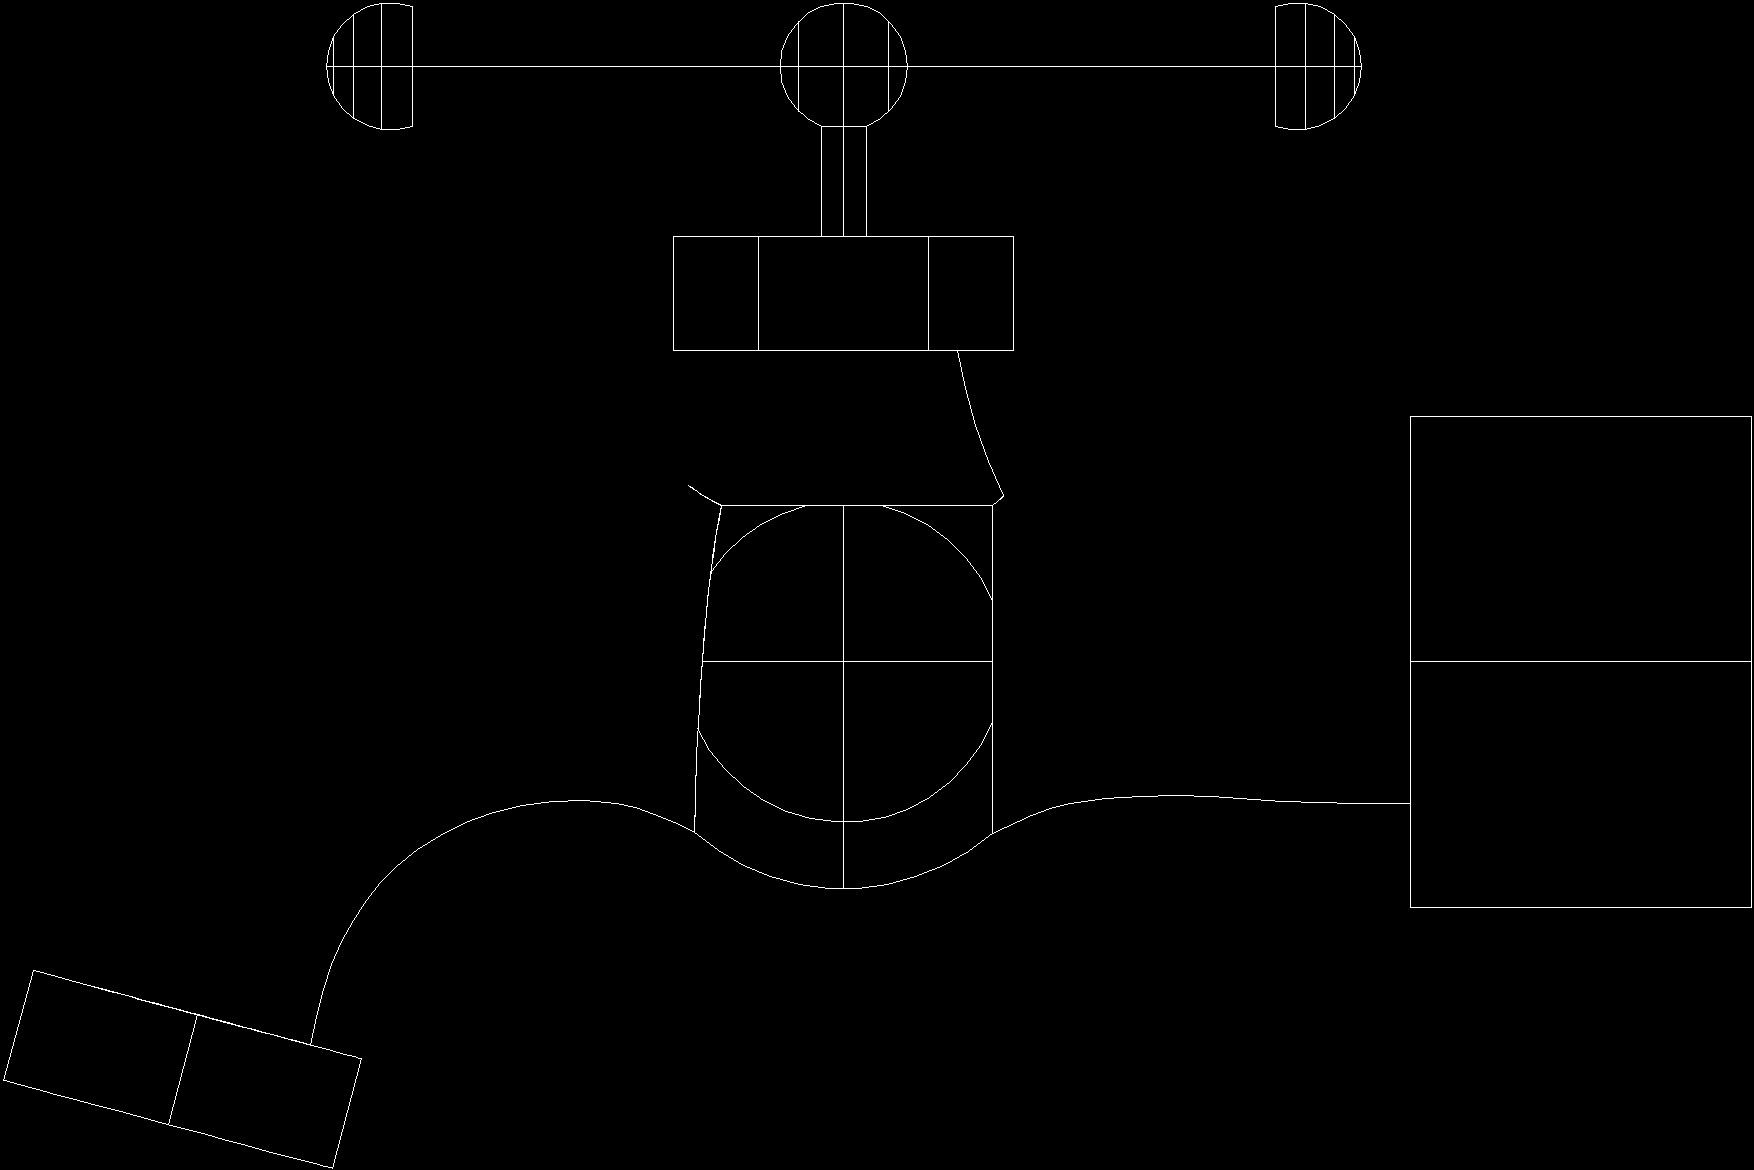 faucet dwg block for autocad  u2022 designscad